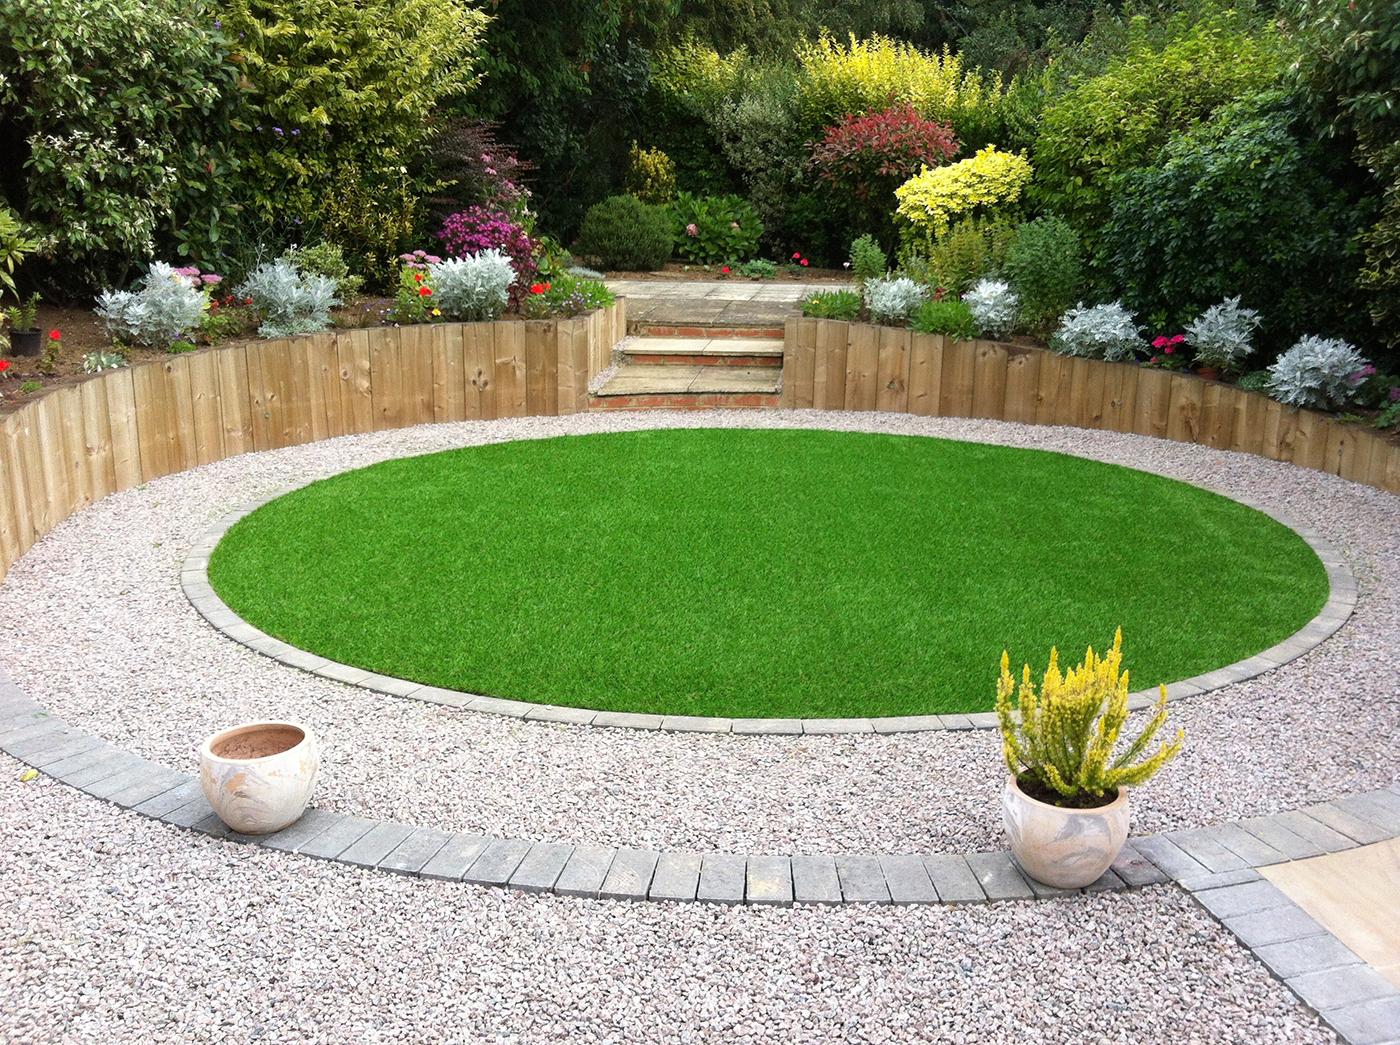 Artificial Grass Projects | Gardens | A Bit of Green on Patio And Grass Garden Ideas id=86706